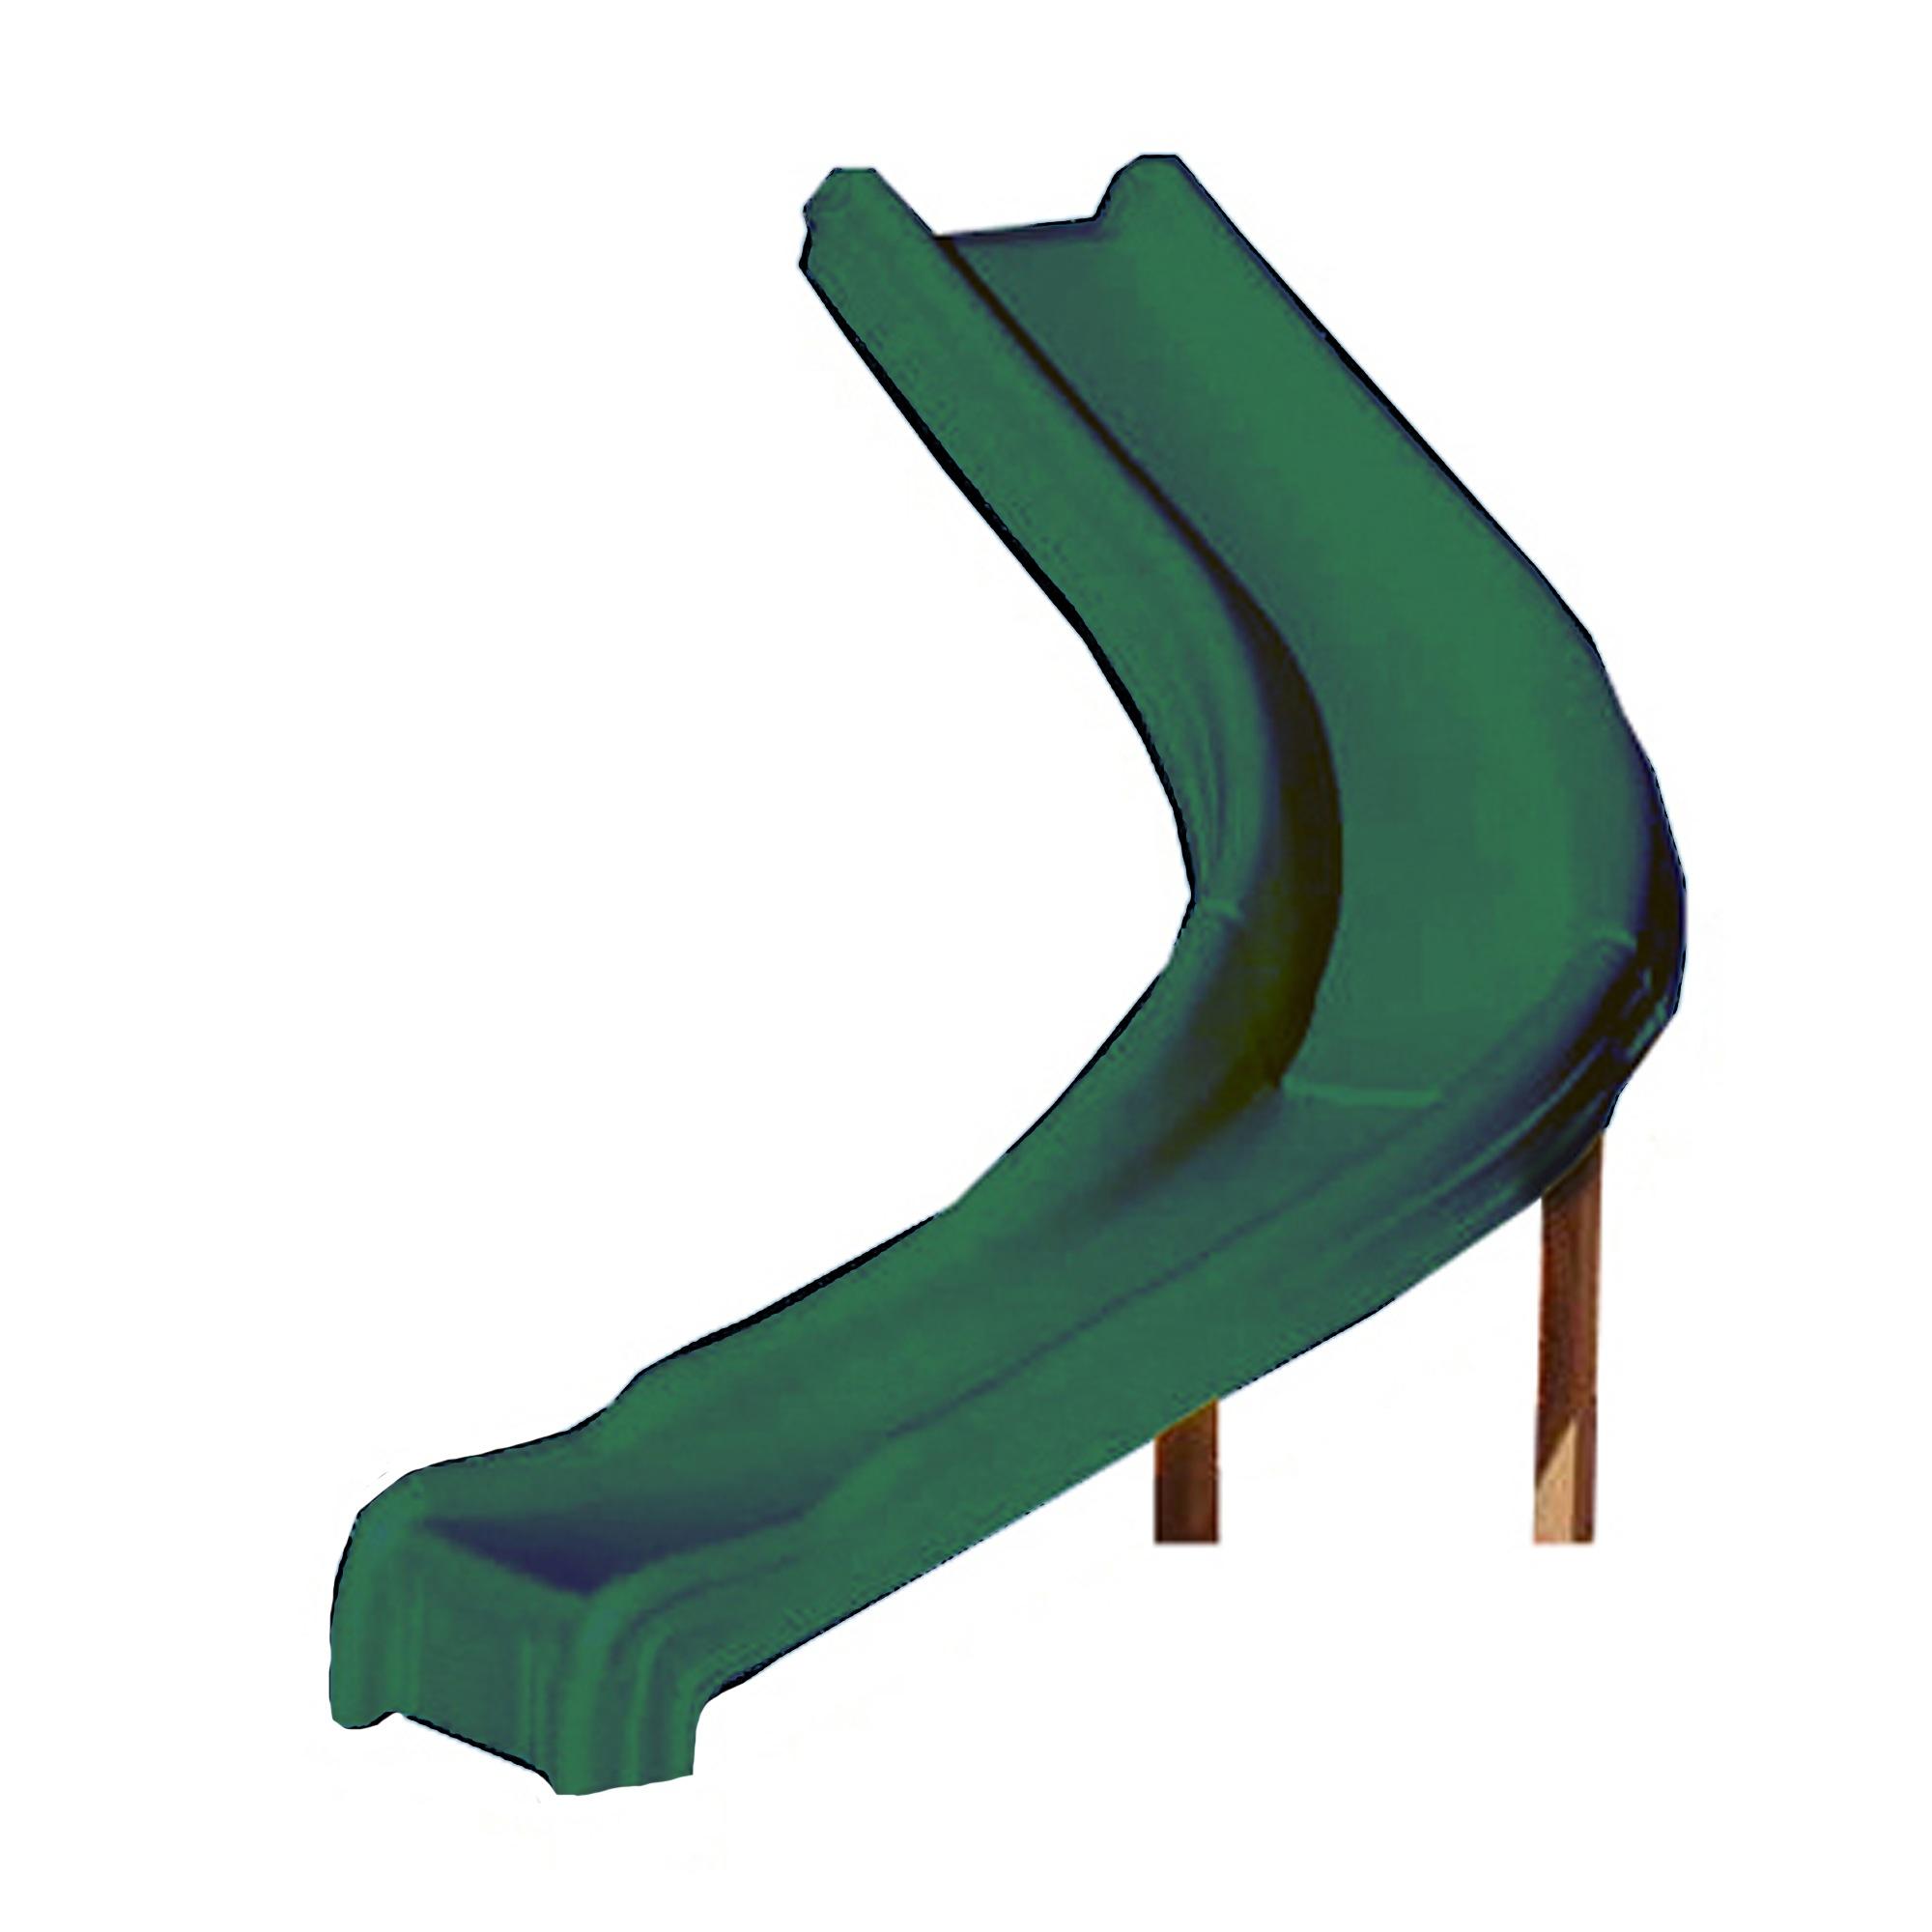 Swing-N-Slide Side Winder Slide with Lifetime Warranty